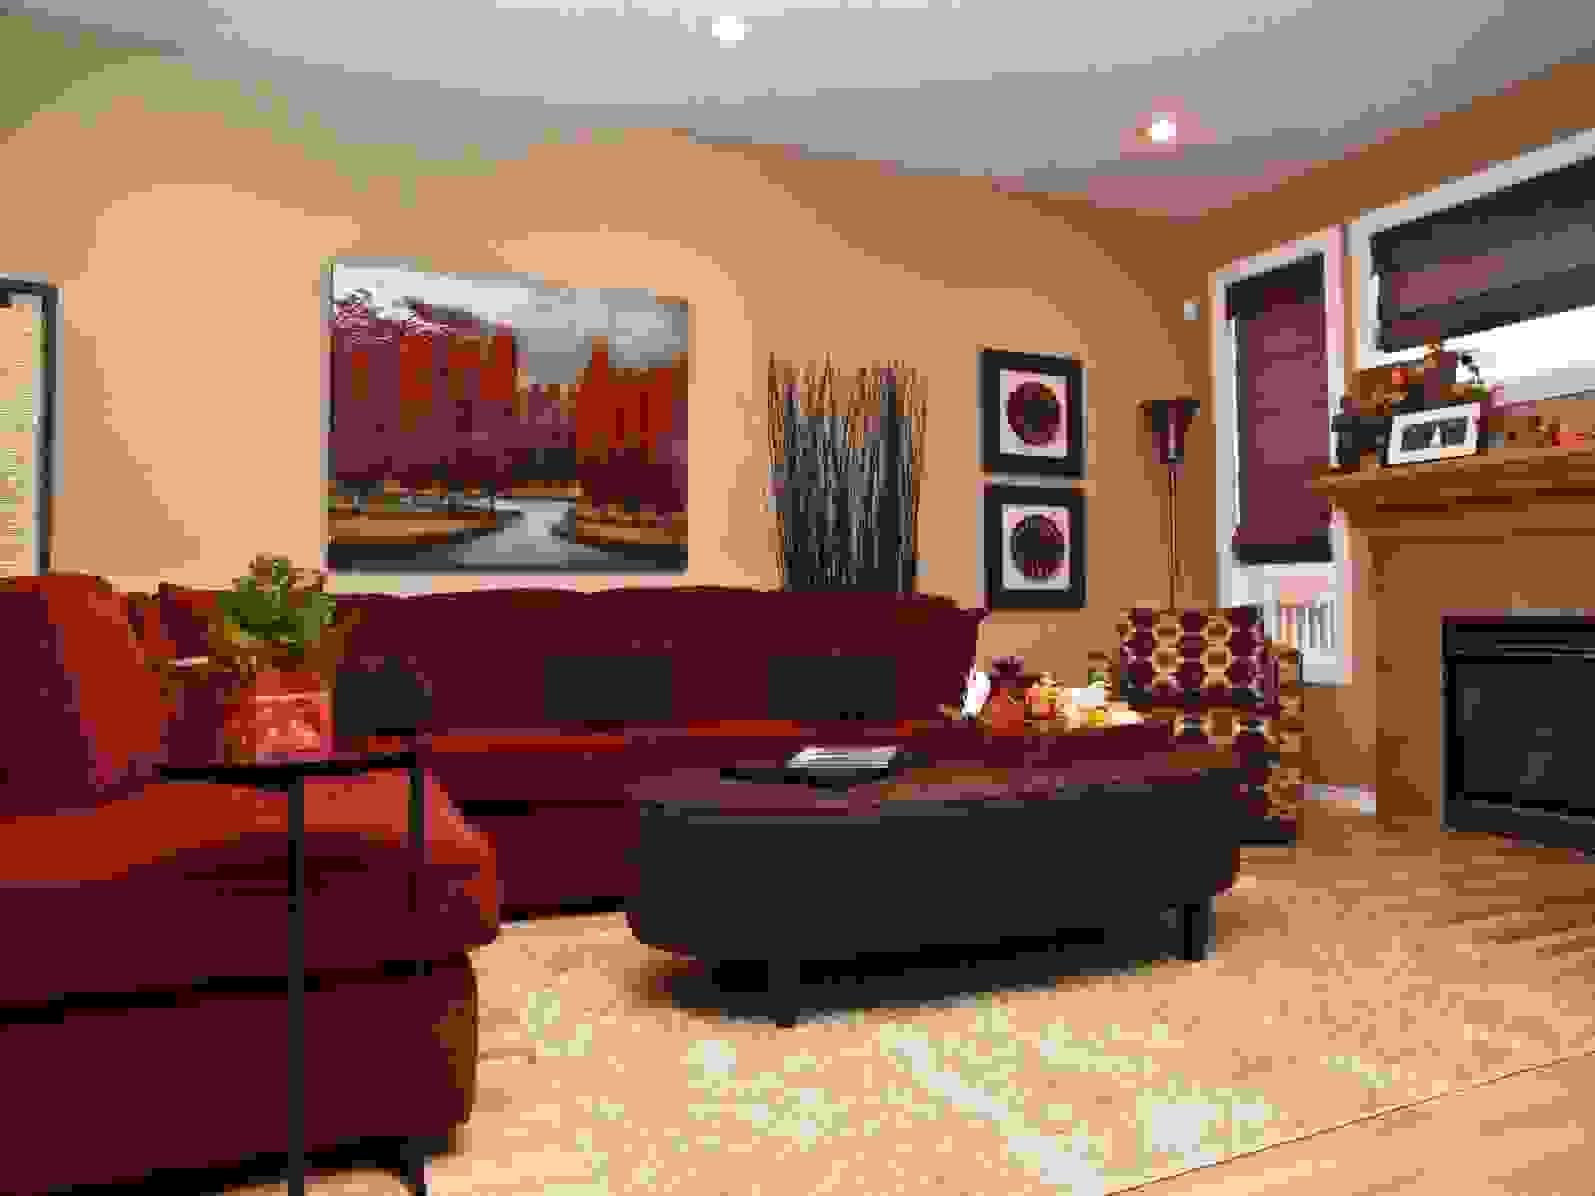 Image source: crismatec.com